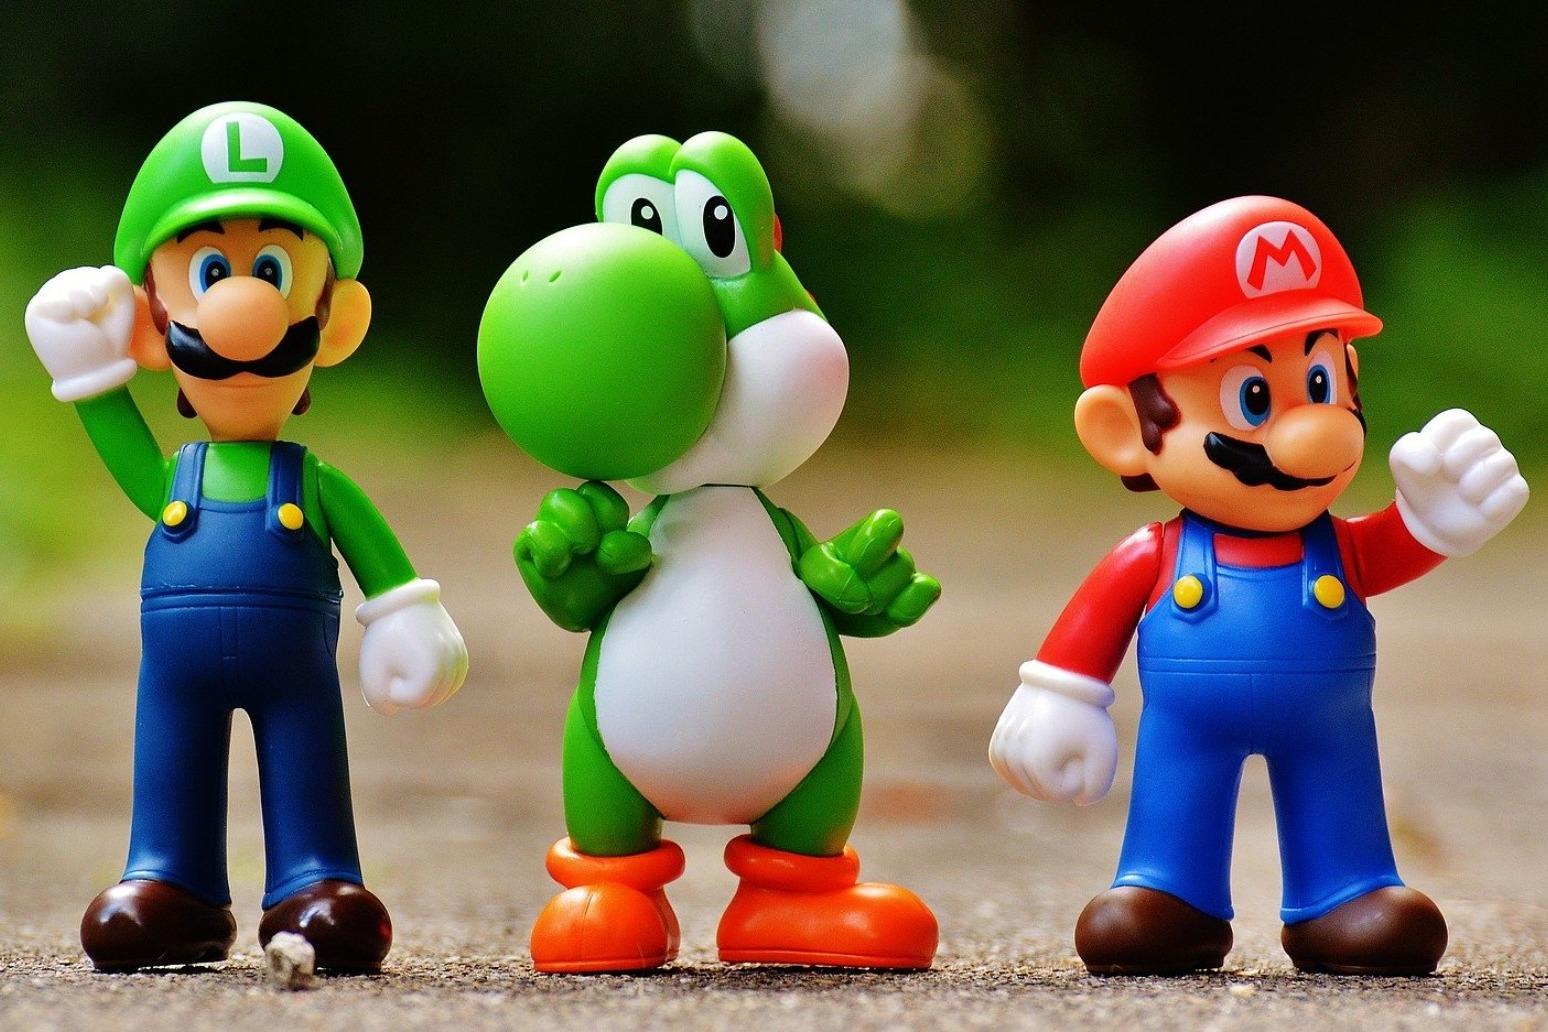 Star-studded voice cast announced for Super Mario Bros film